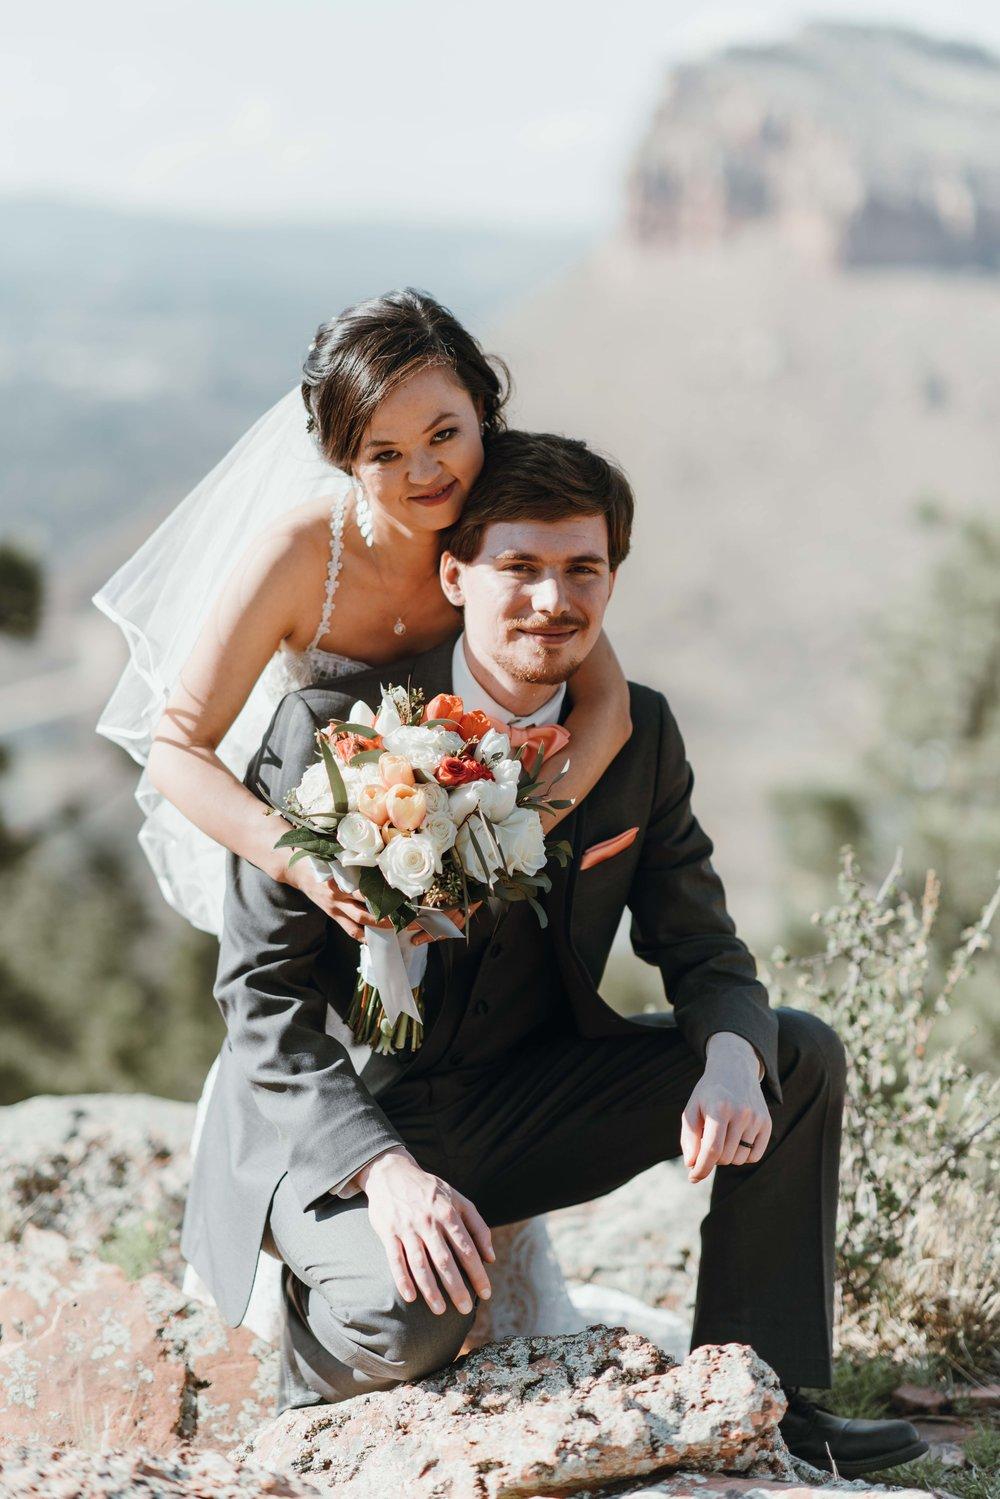 denver wedding photographer lioncrest manor in lyons ben and mali -DSC_1901.jpg